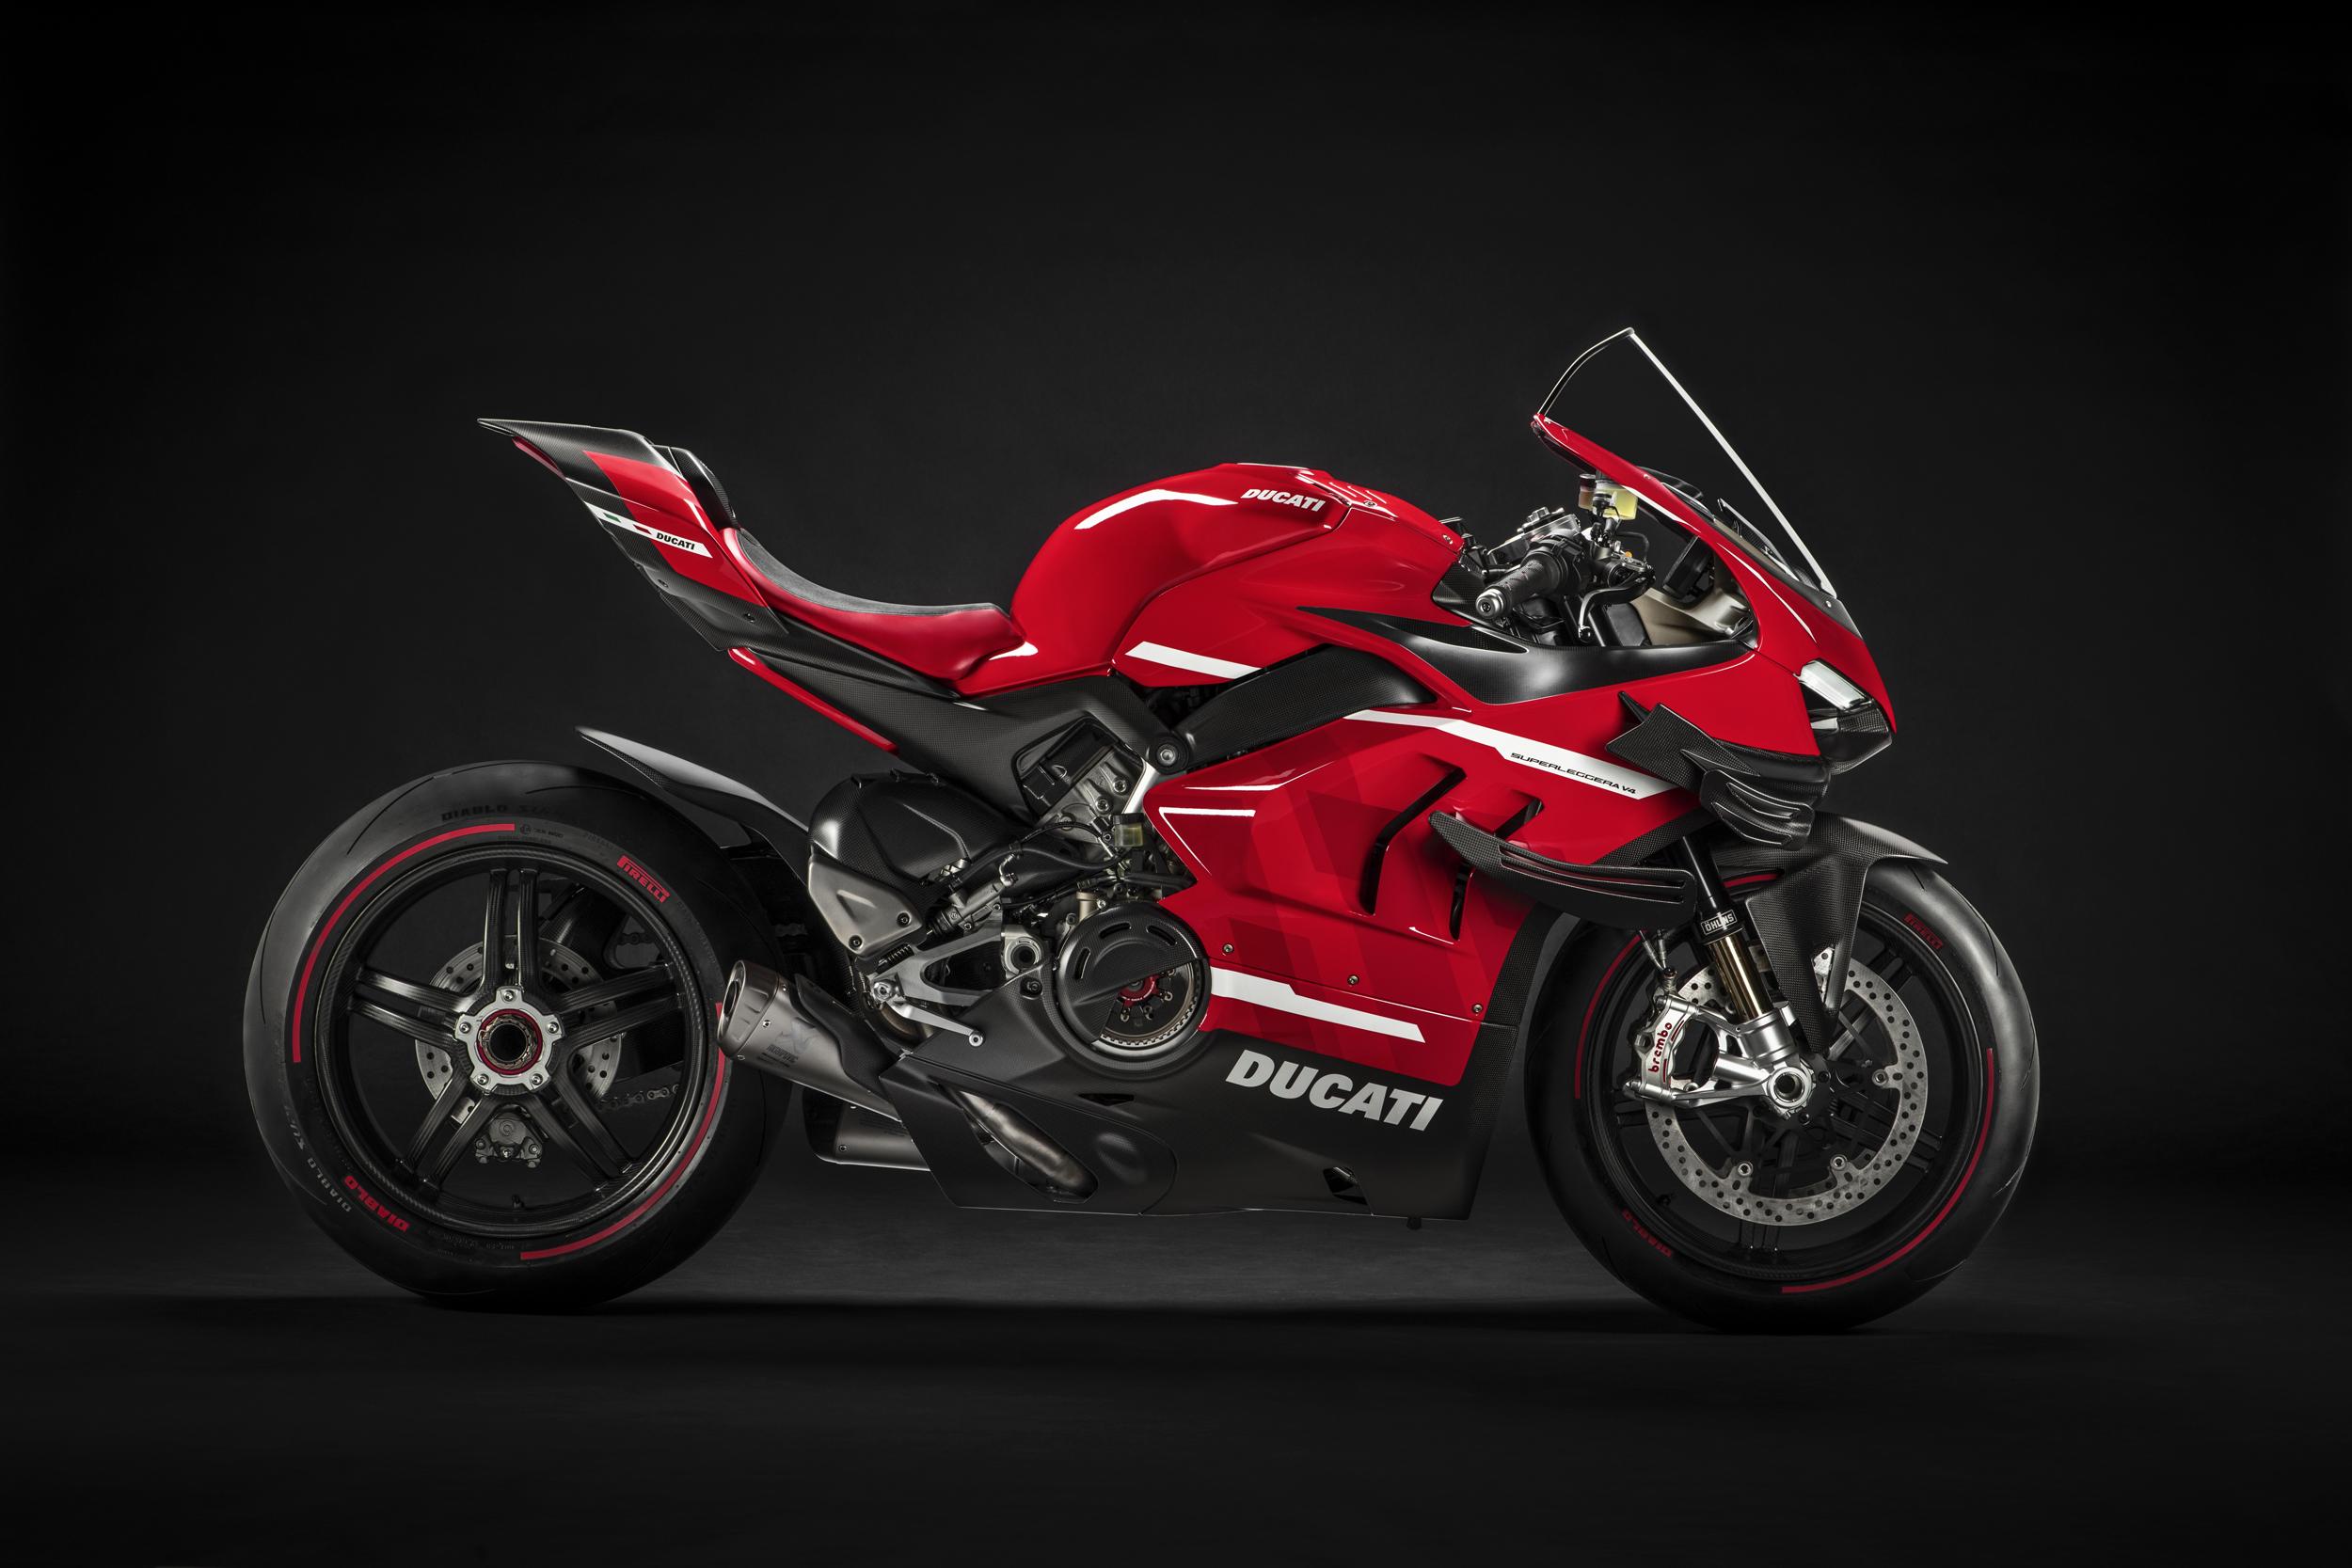 2020 Ducati Superleggera V4 [2]